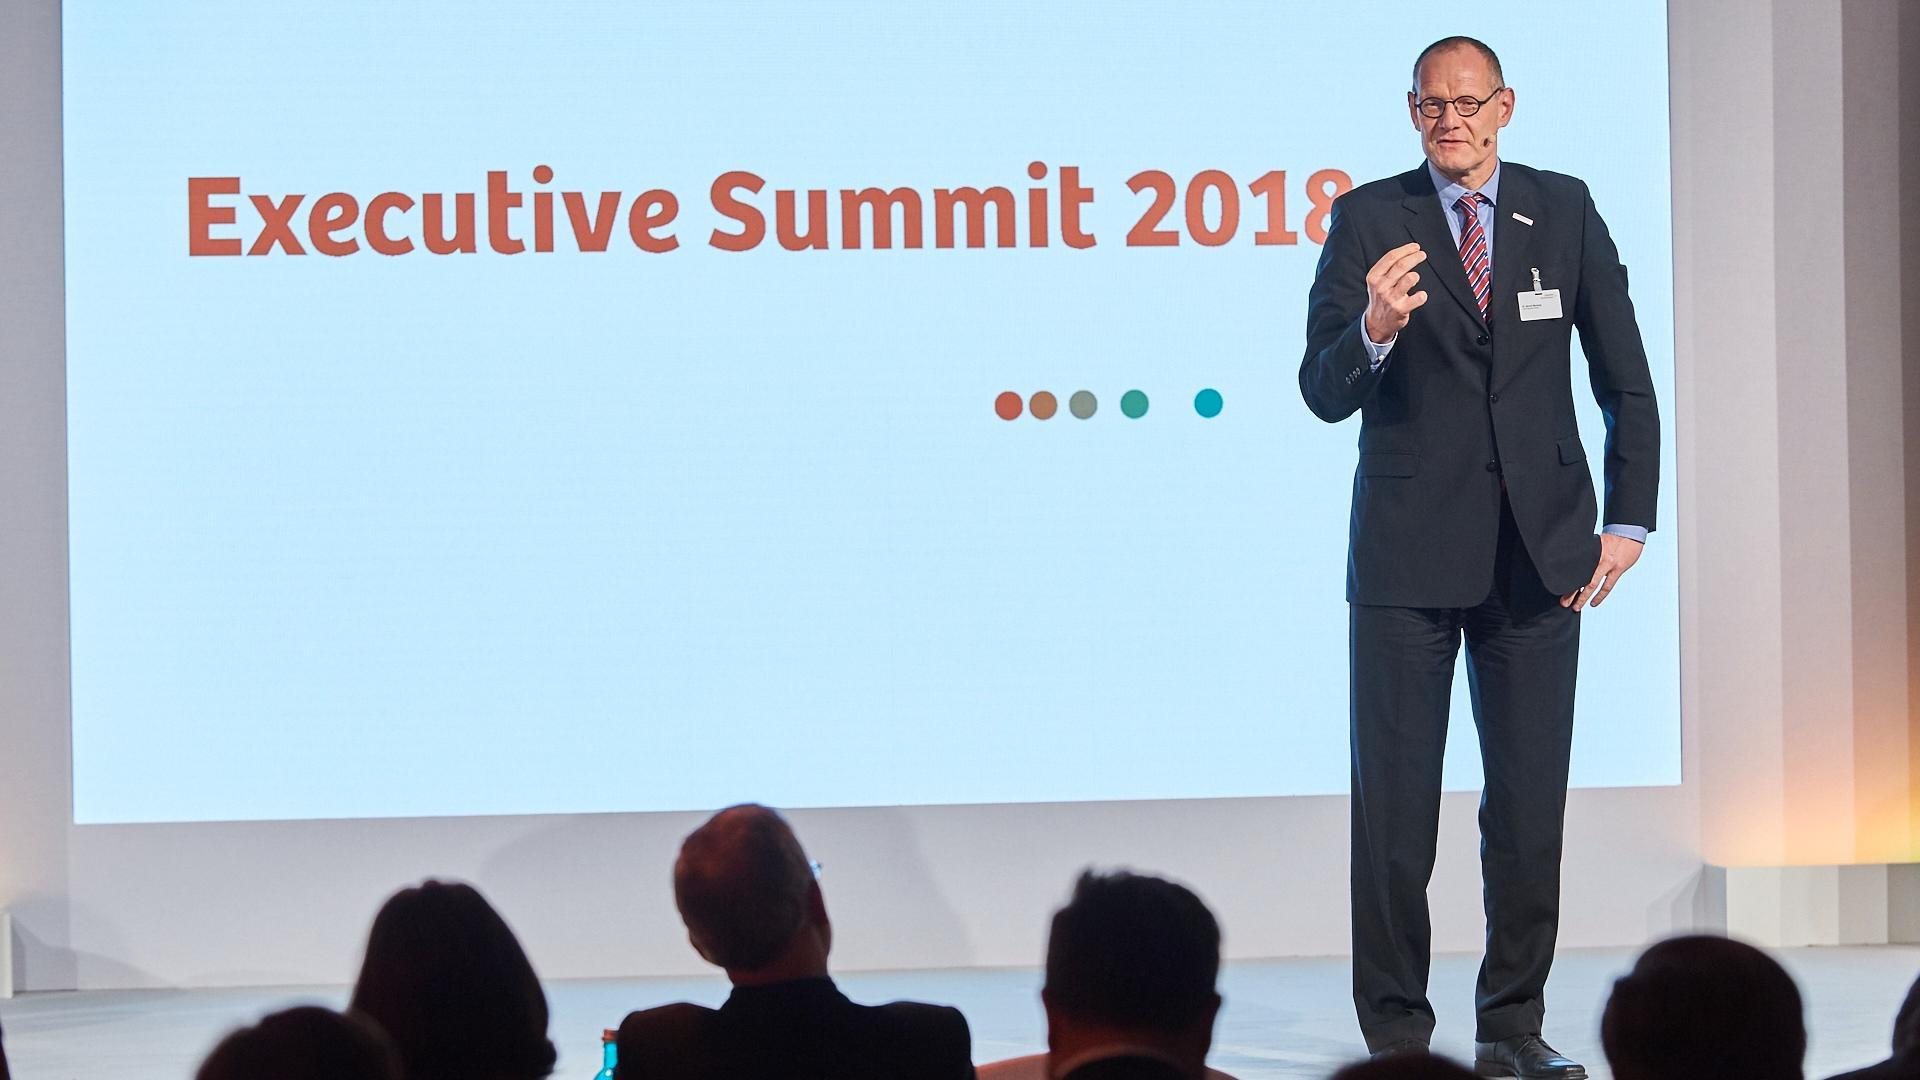 Executive Summit 2018